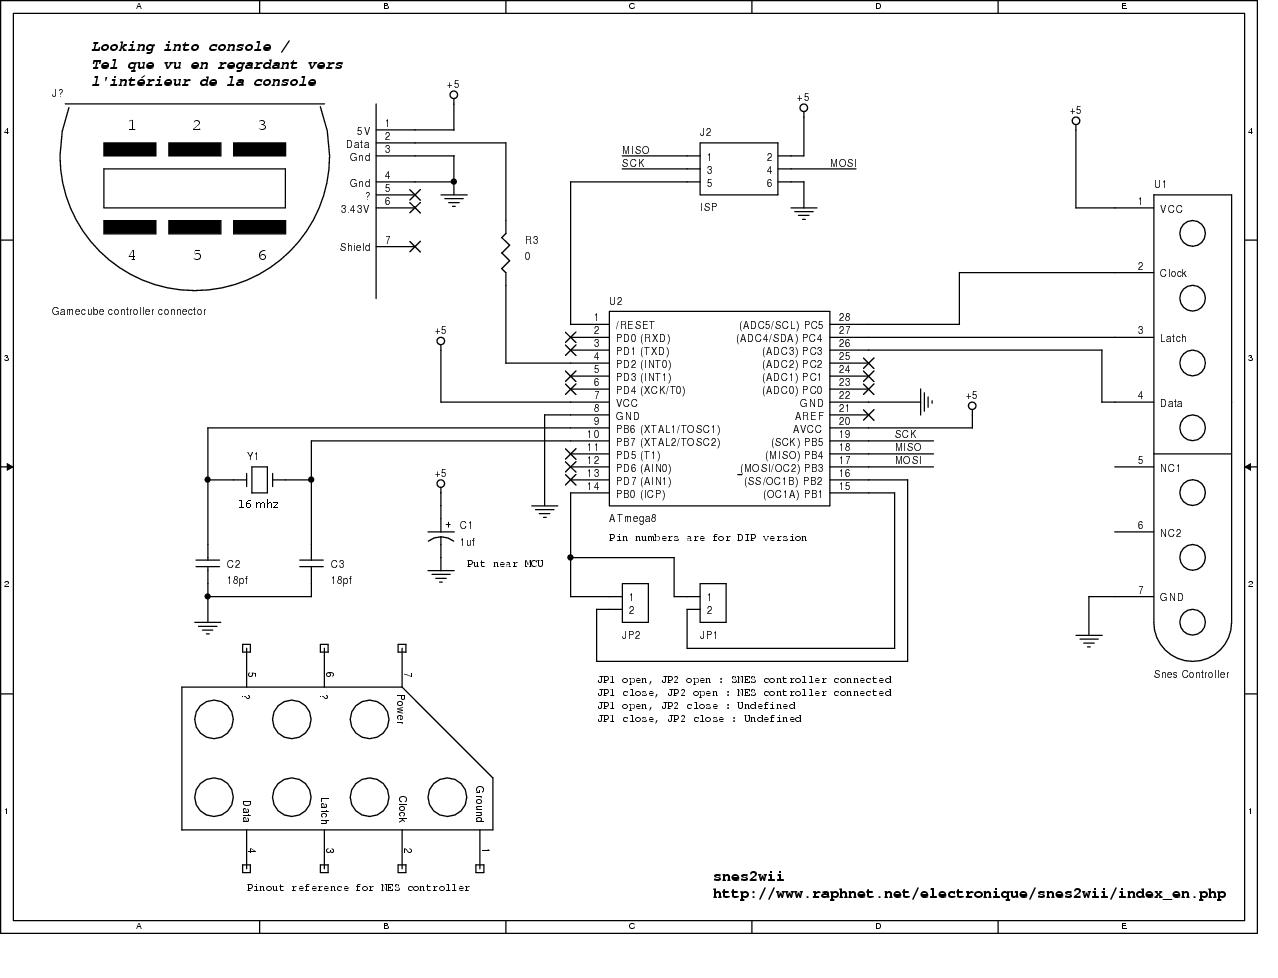 super nintendo controller wiring diagram